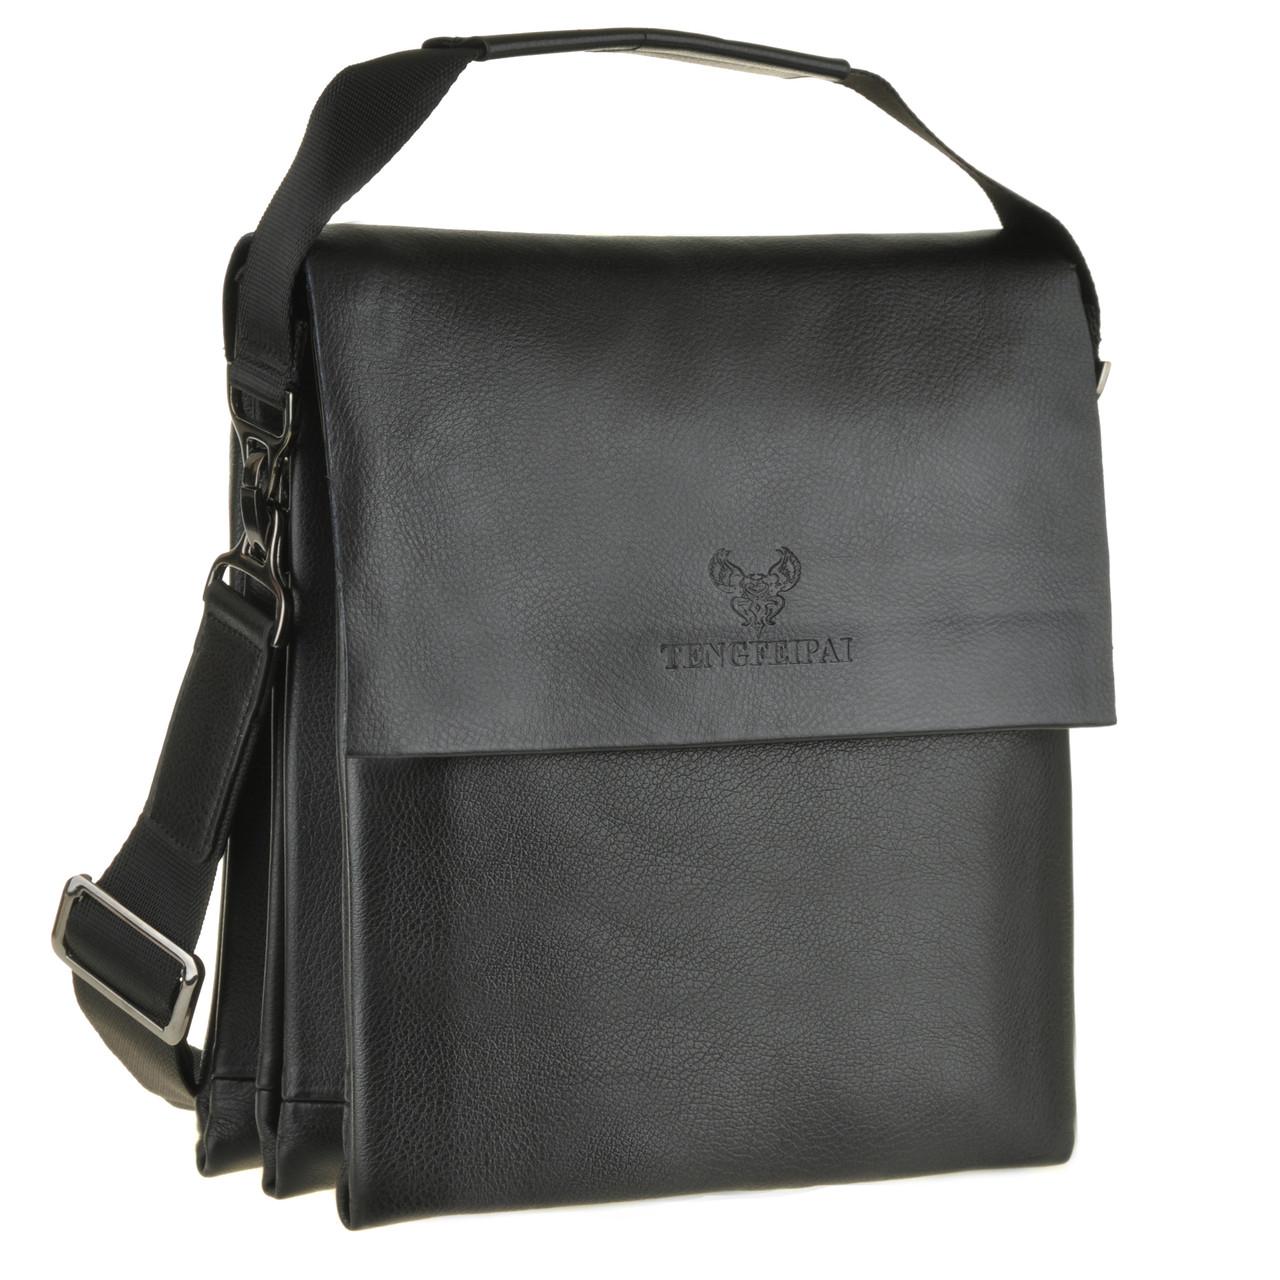 Мужская сумка кожаная TENGFEIPAI вертикальная  23х27х9  ксА6001-3